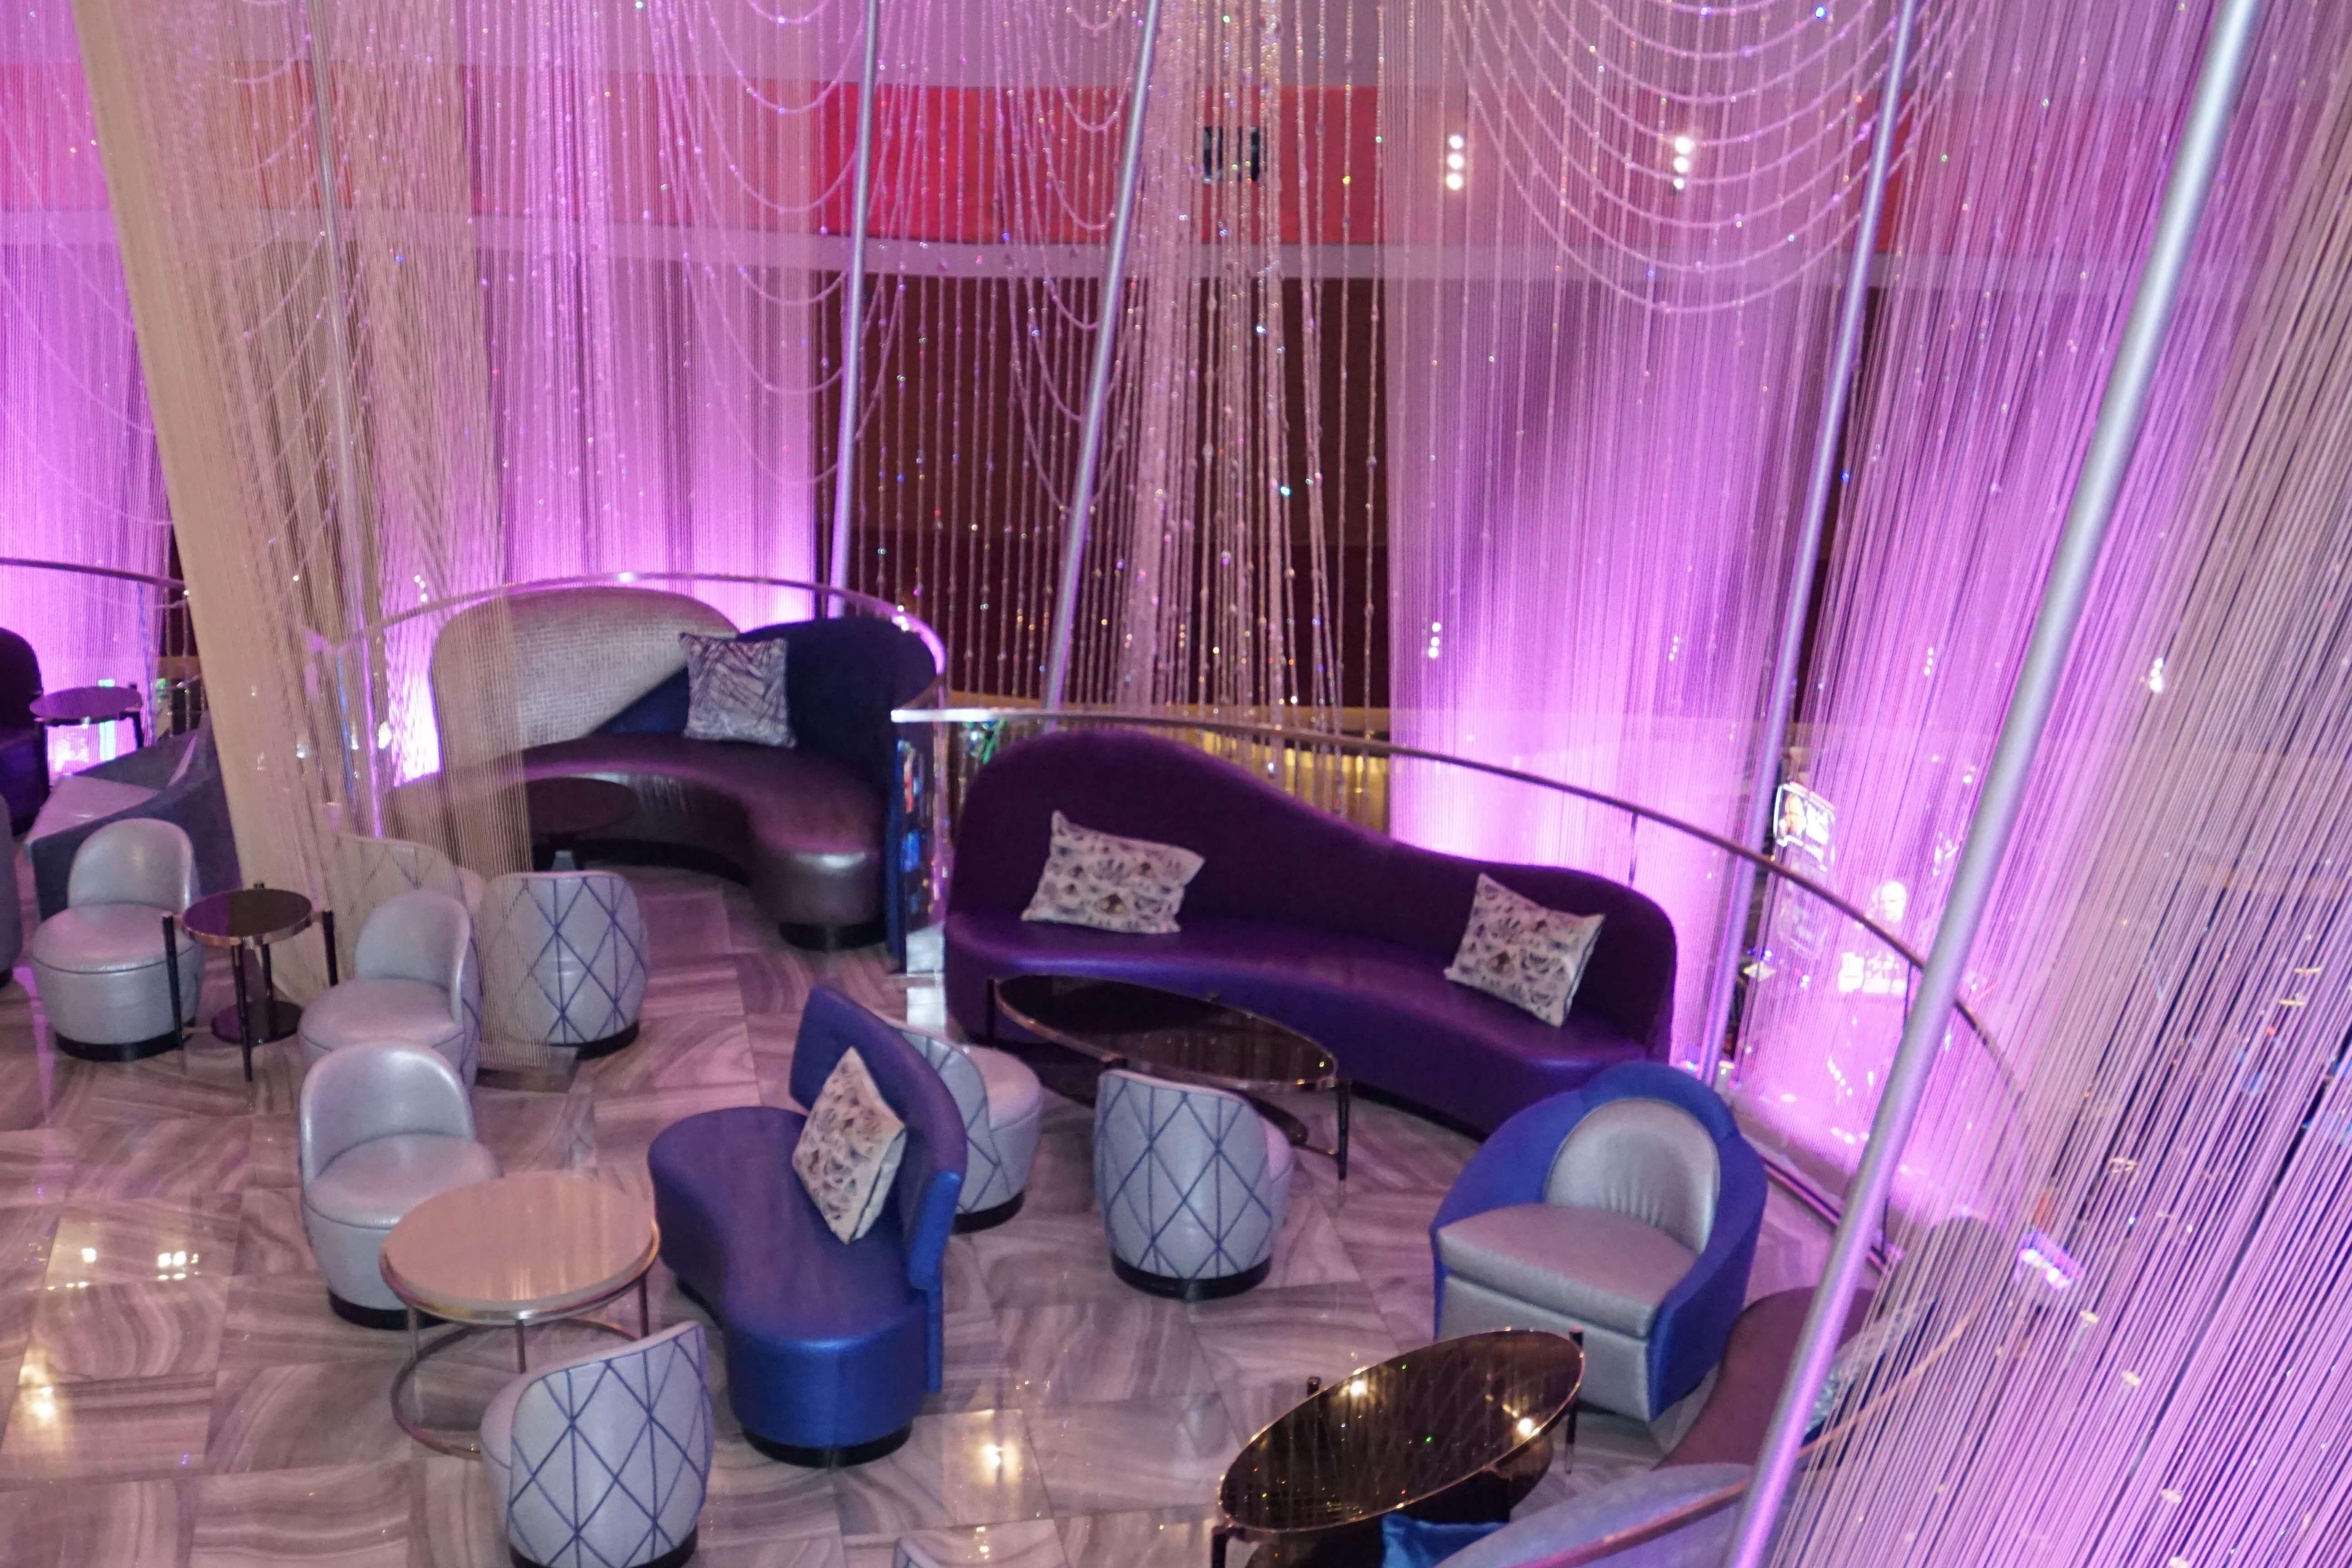 Chandelier Bar at the Cosmopolitan Hotel